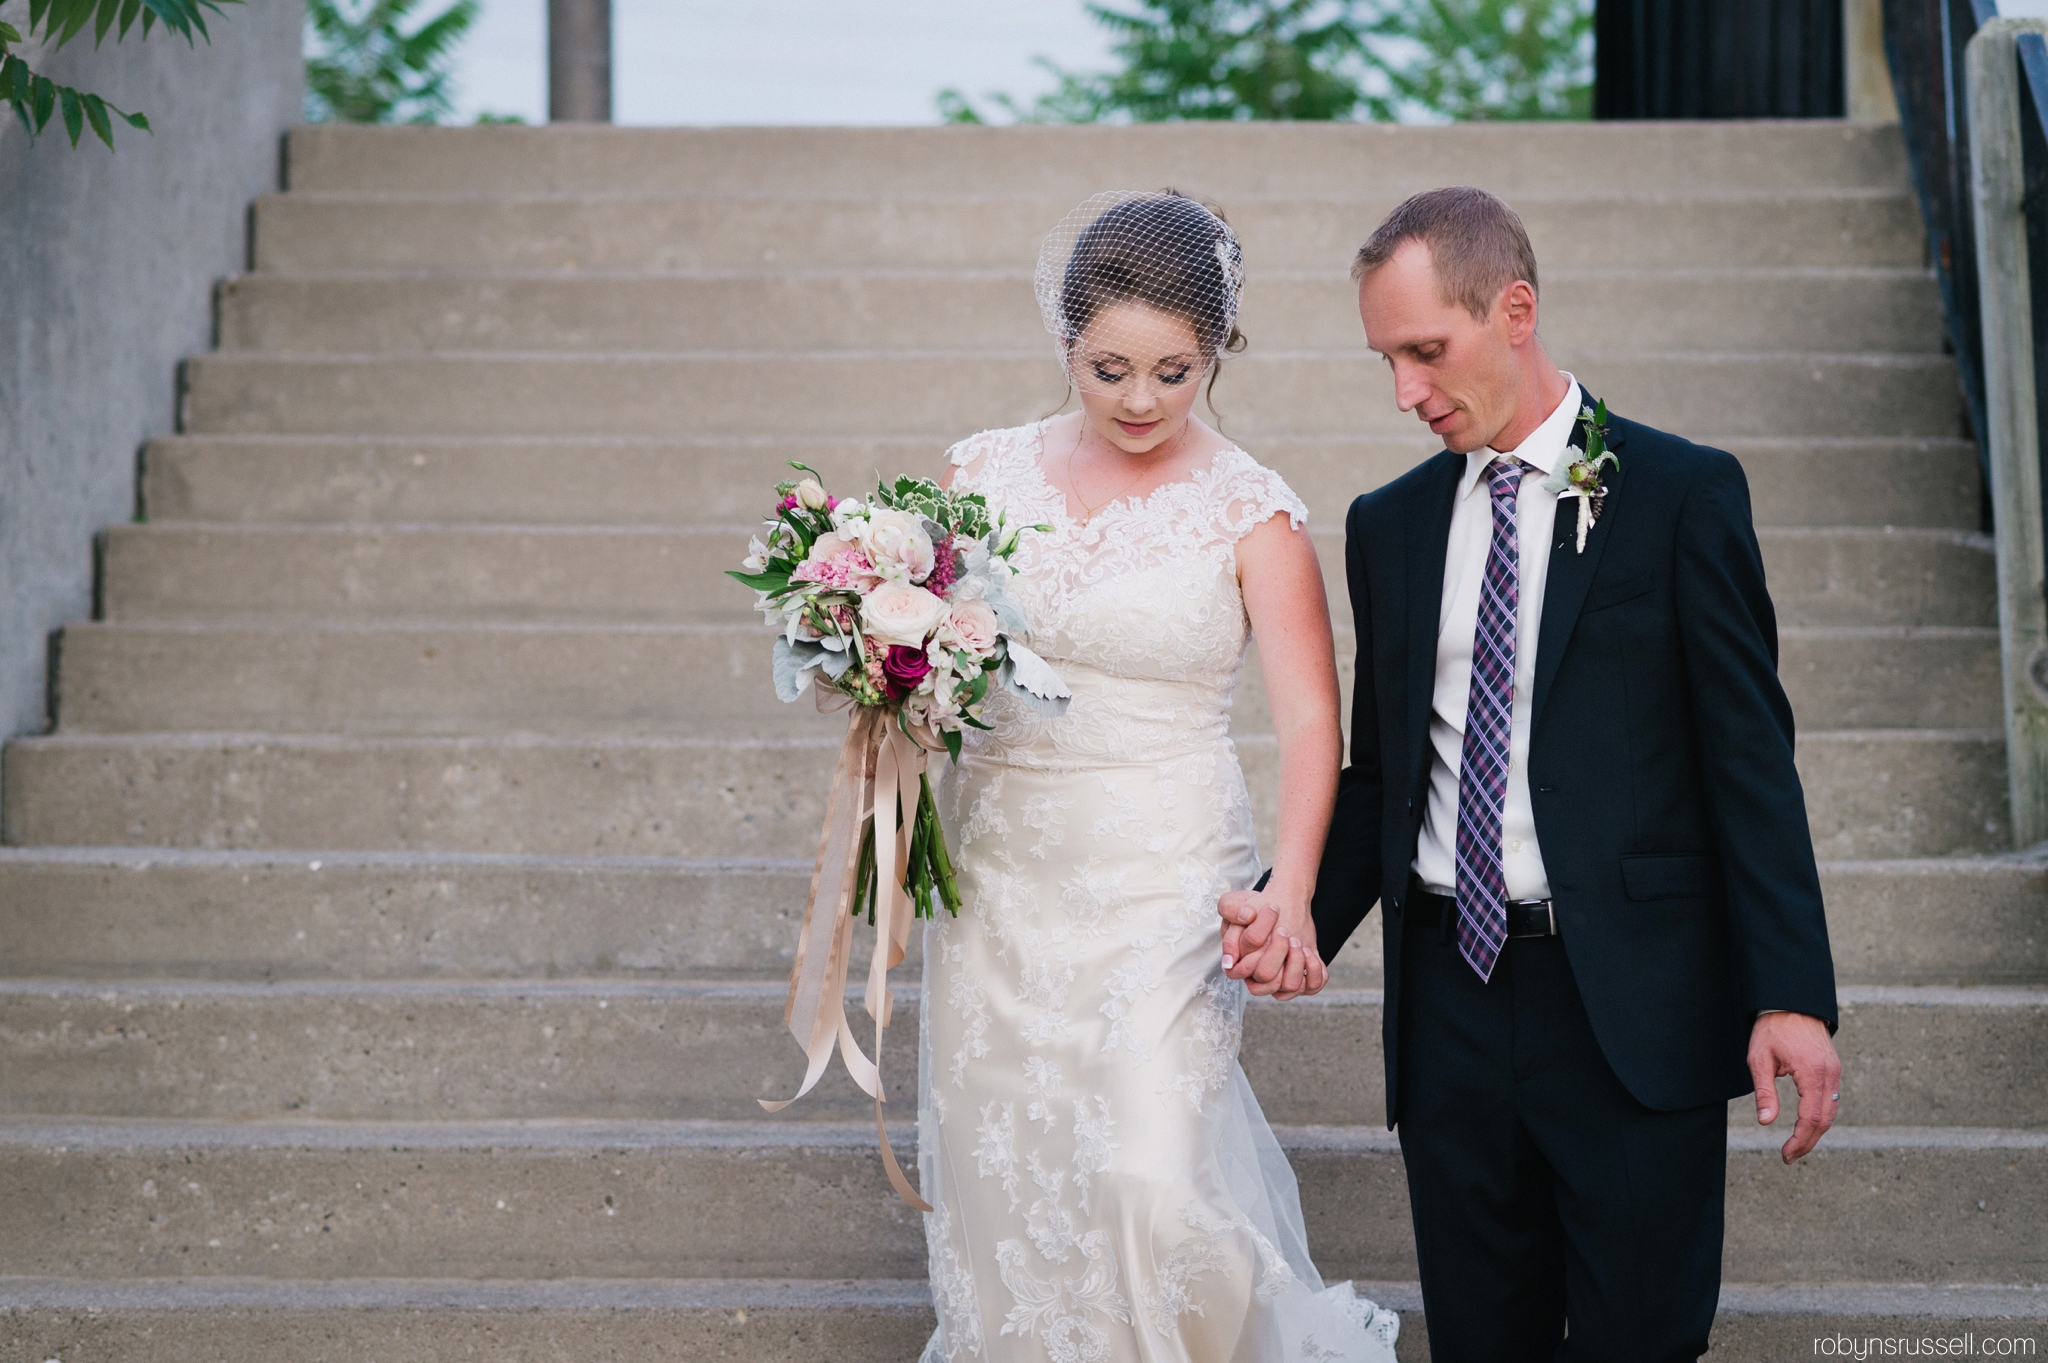 47-bride-and-groom-walking-at-cambridge-mill.jpg